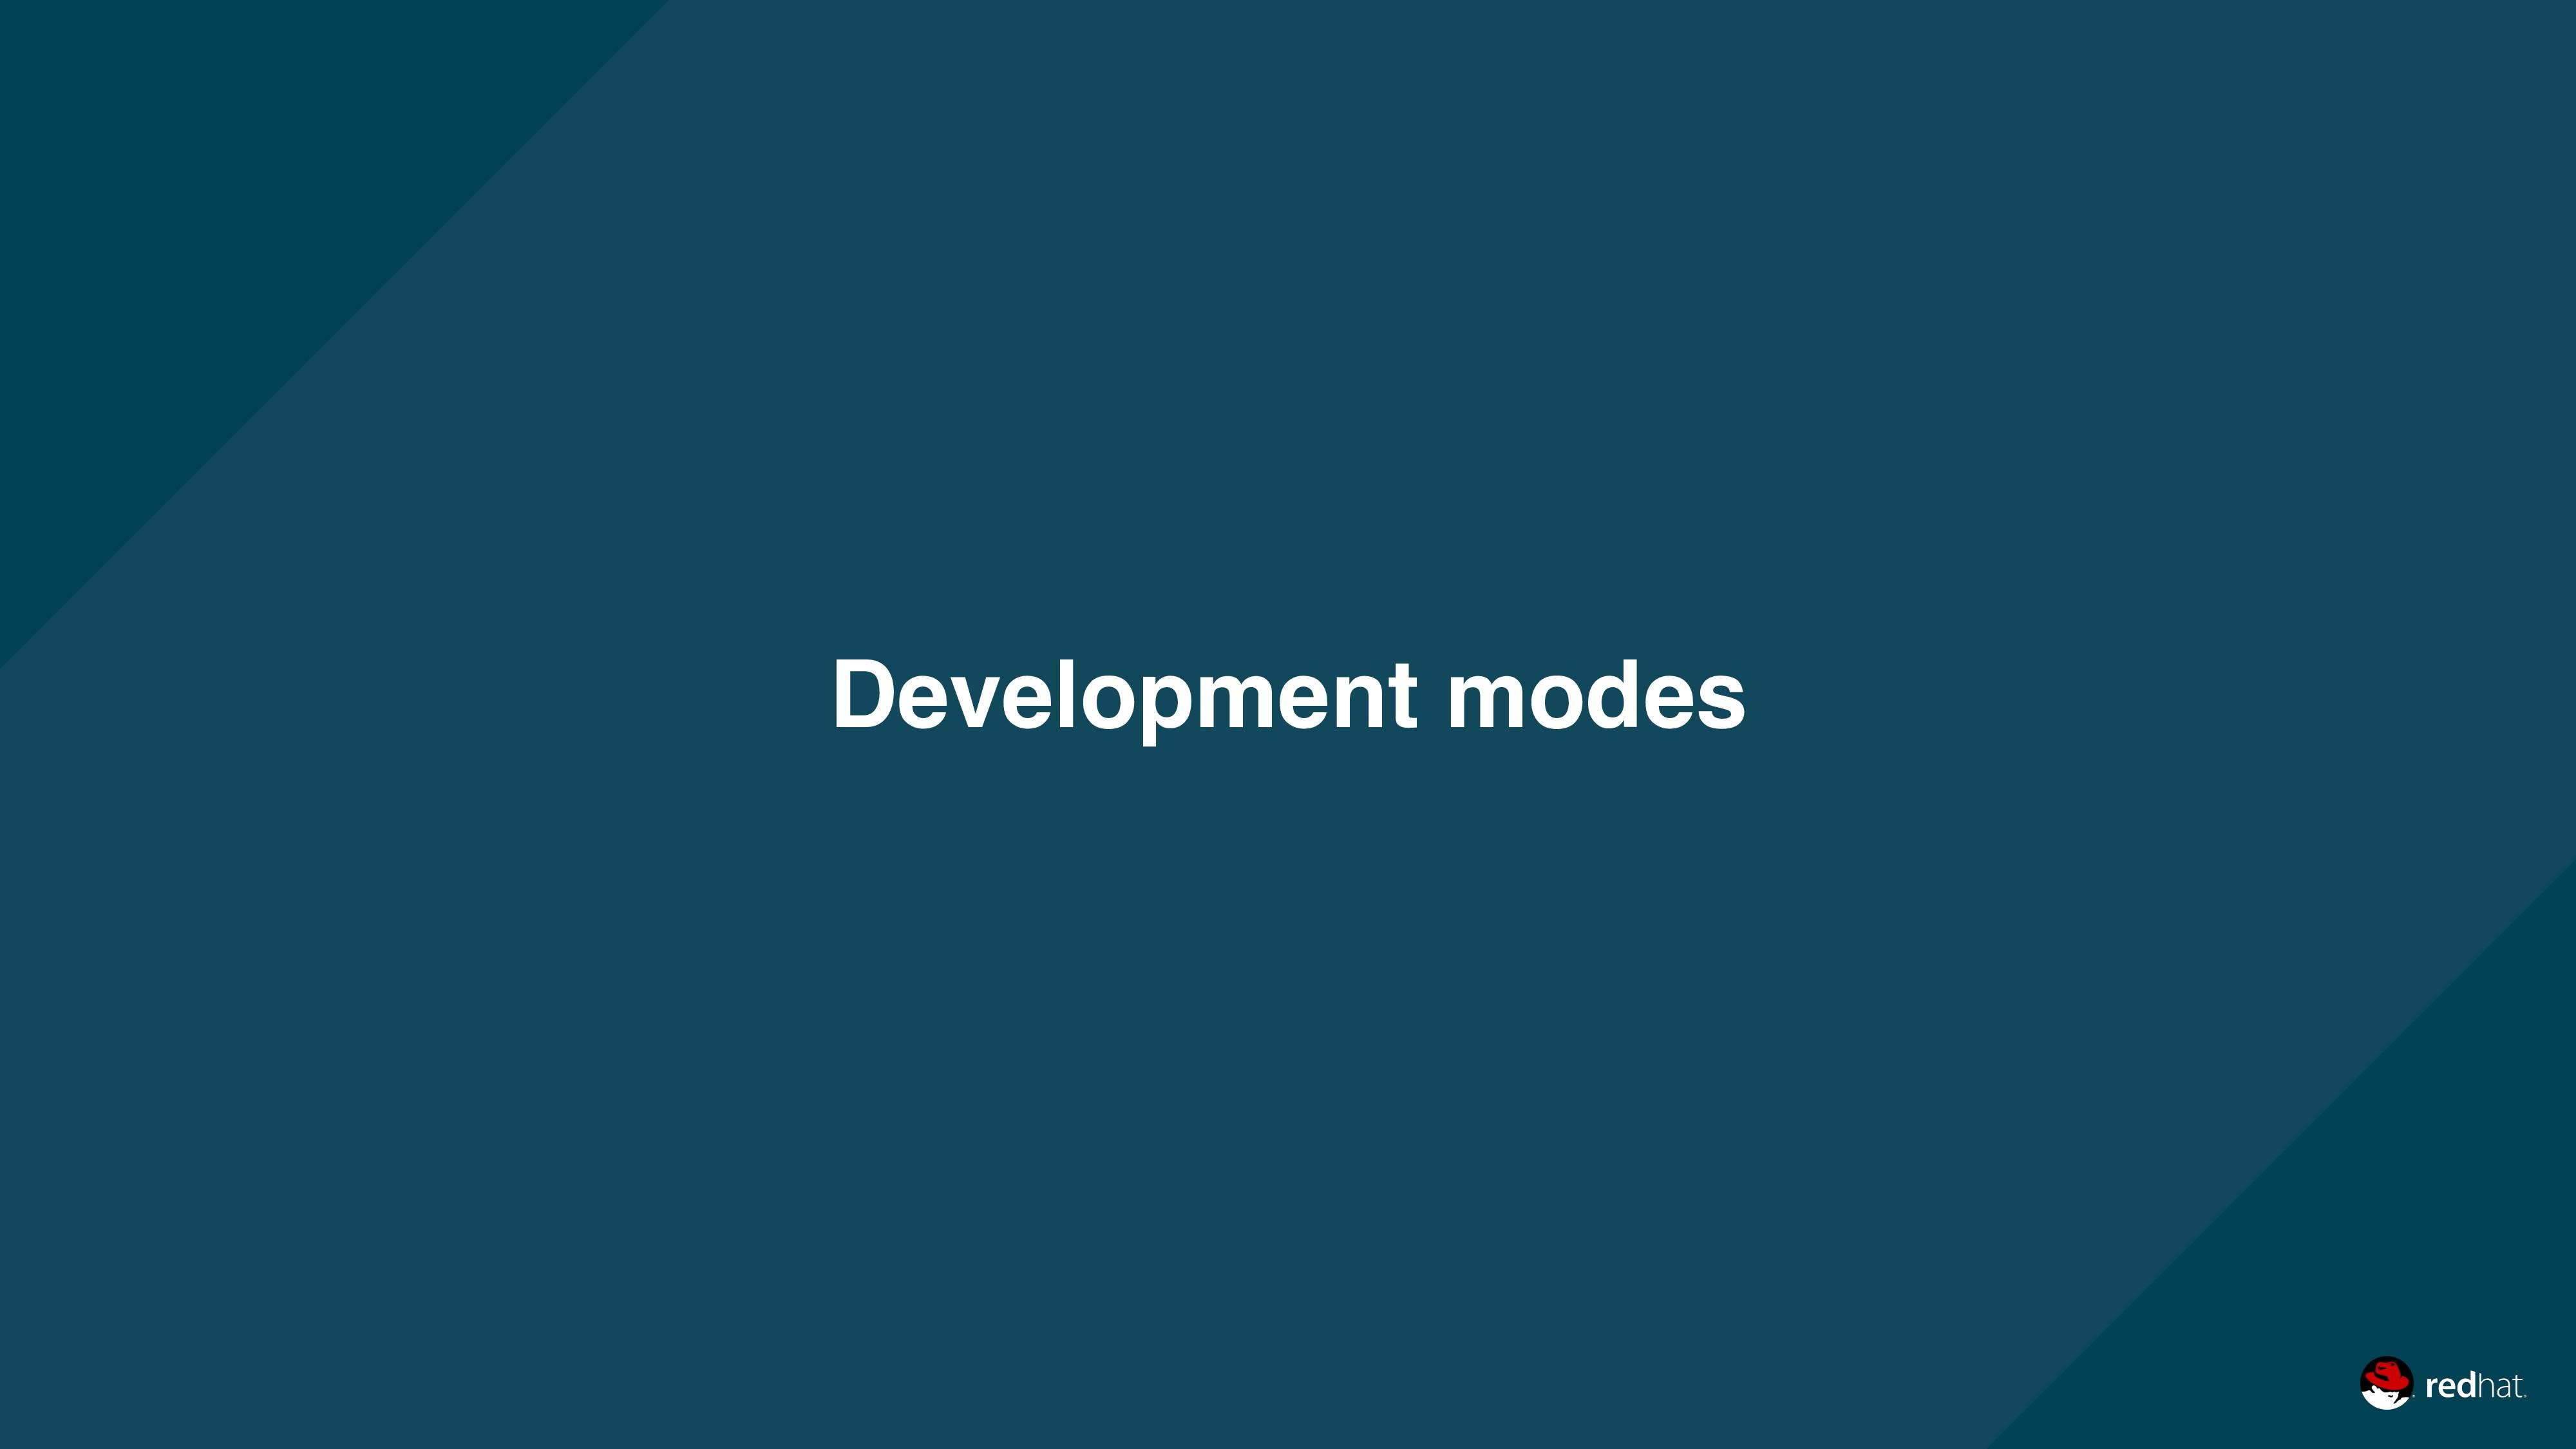 Development modes